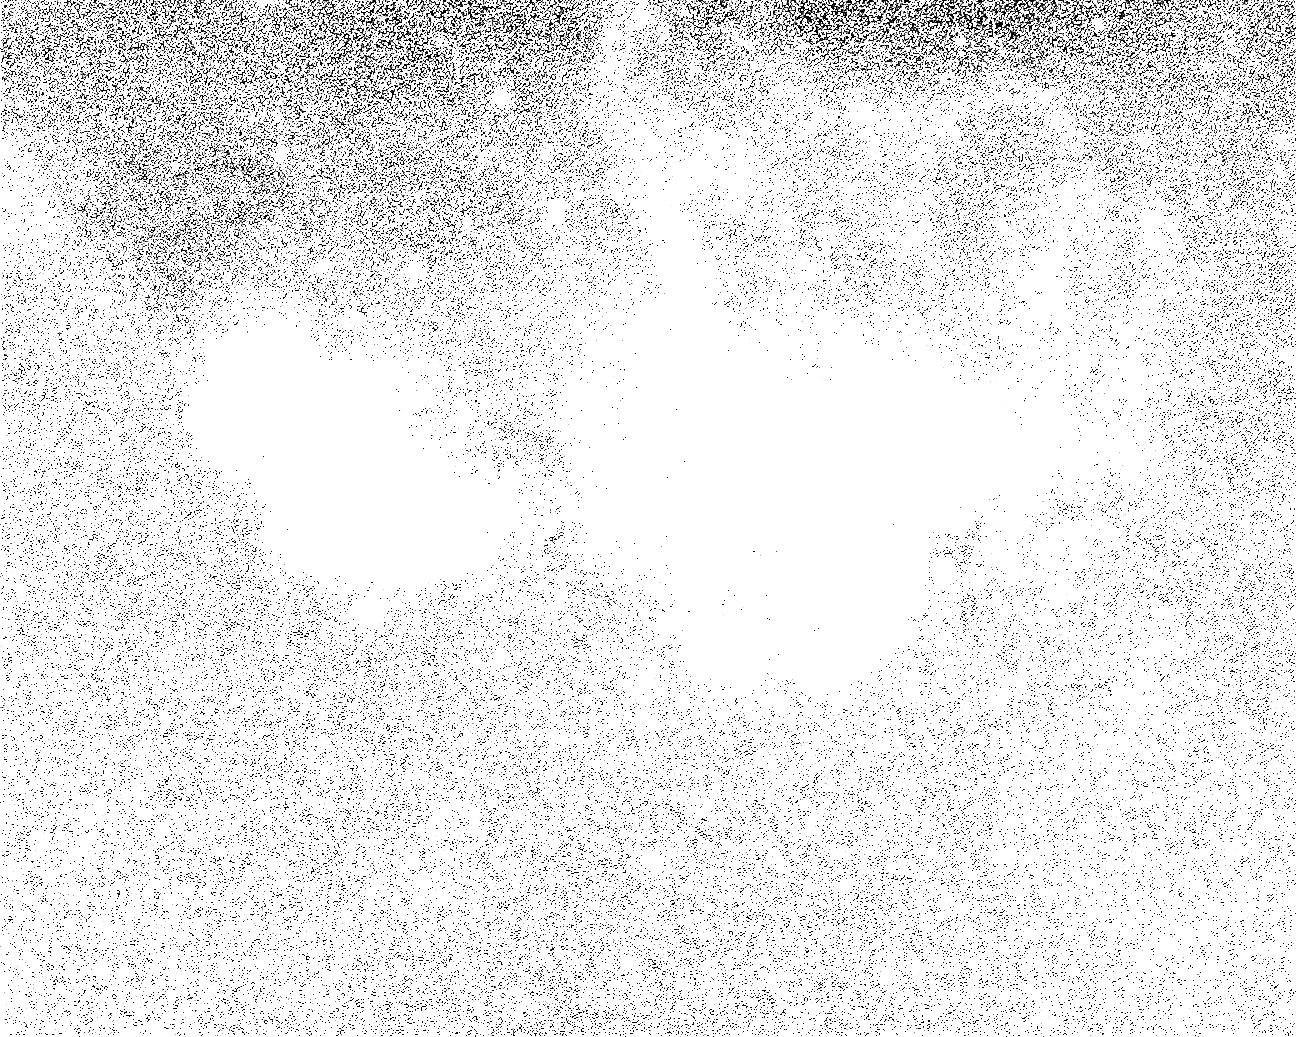 Heart and Soul Nebula IC1805 - Astronomy Log